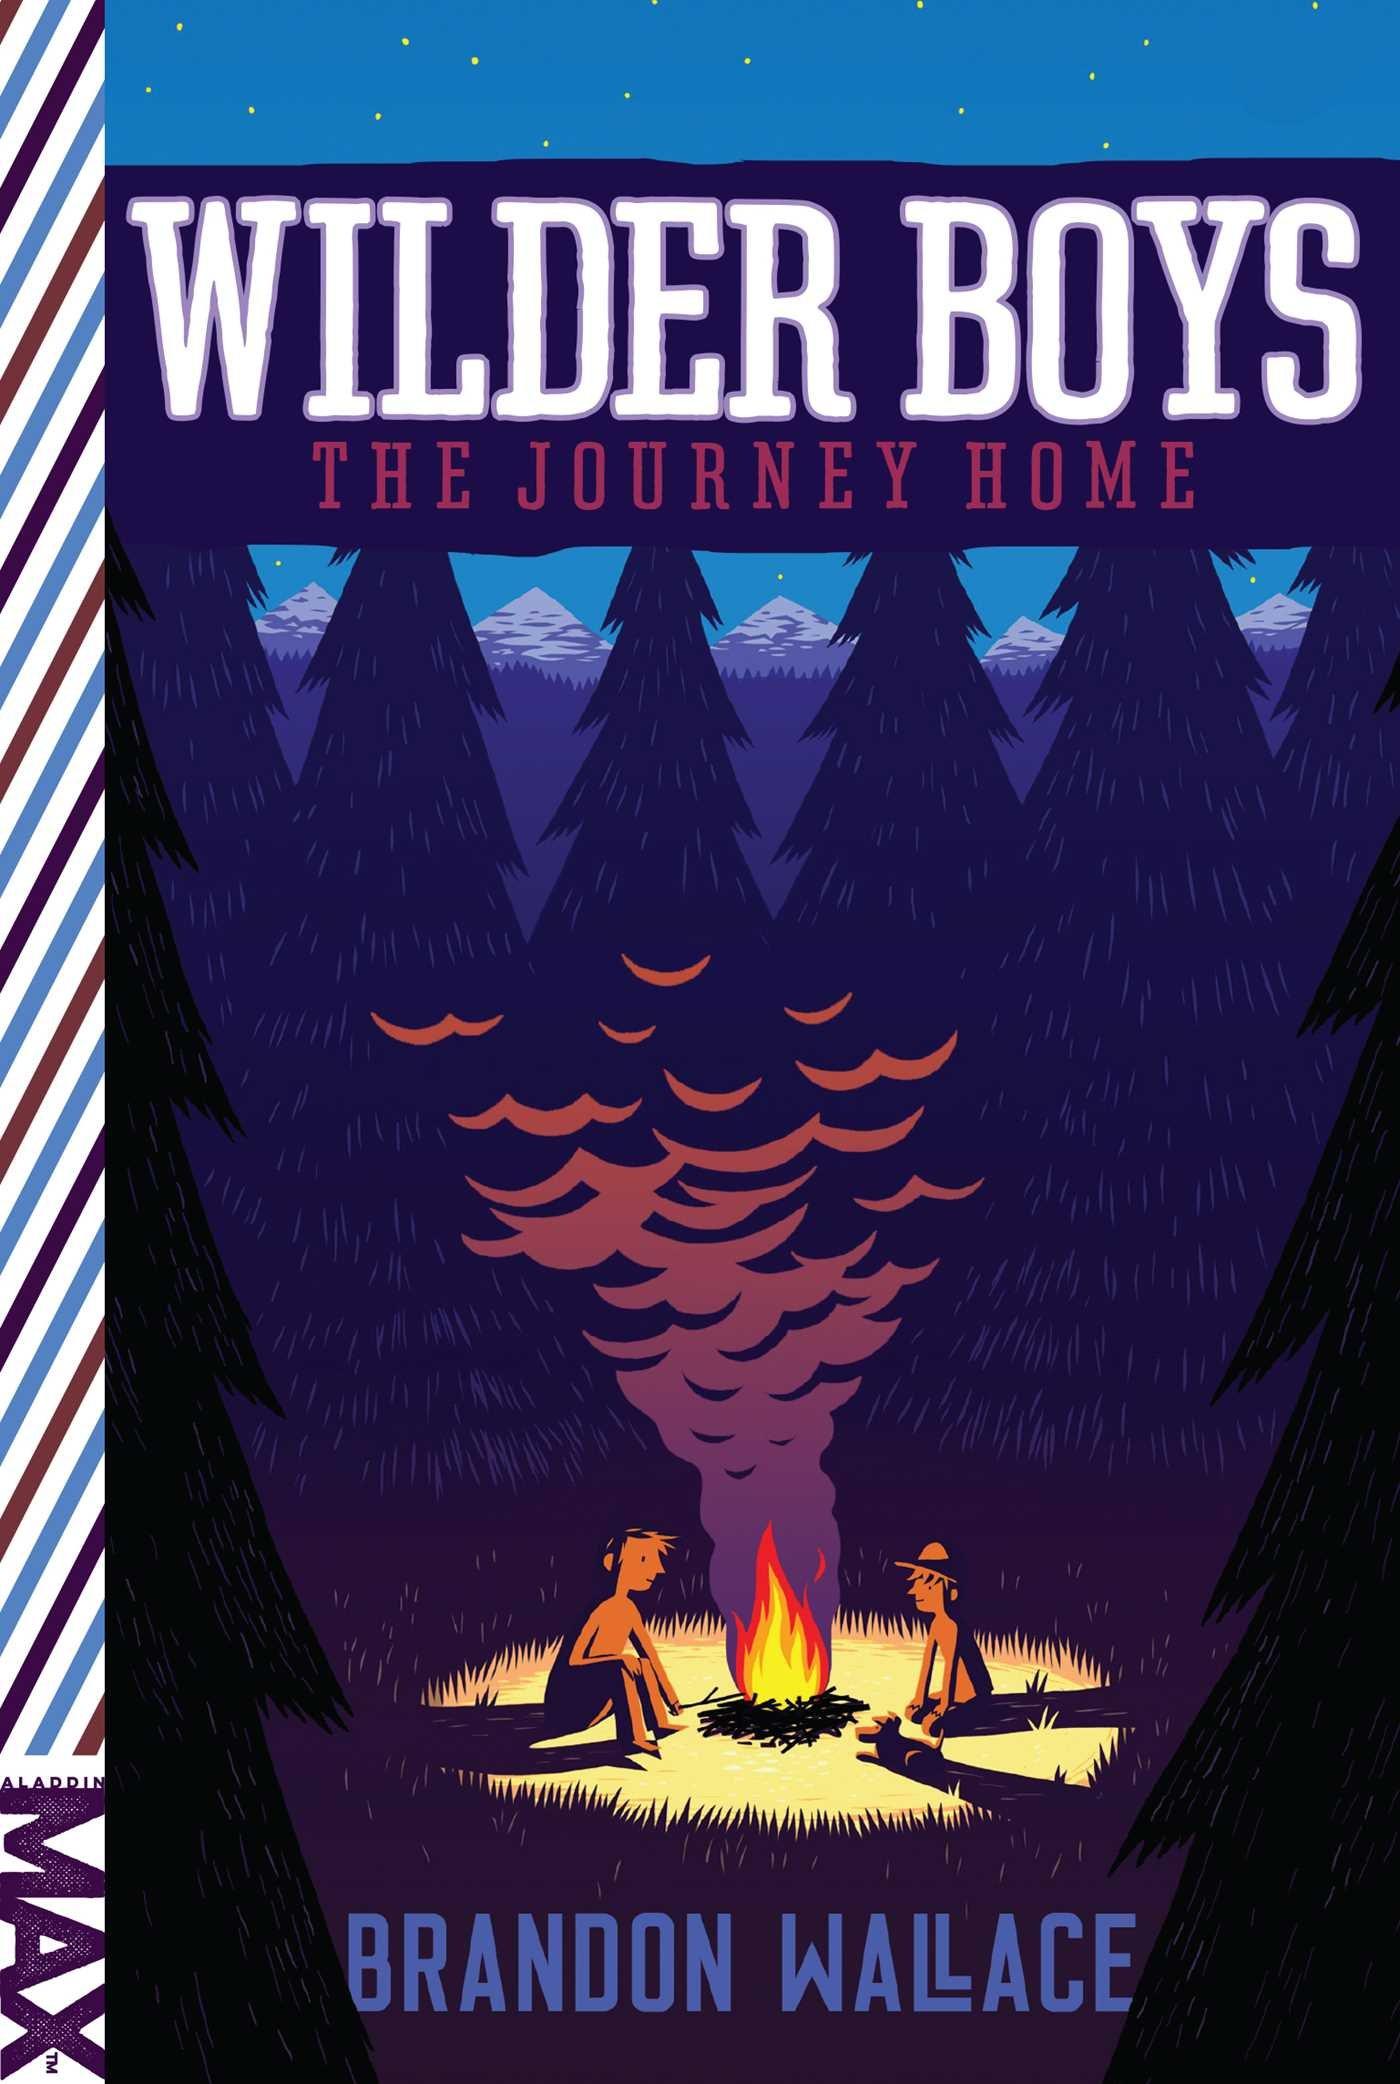 The Journey Home (Wilder Boys) ebook